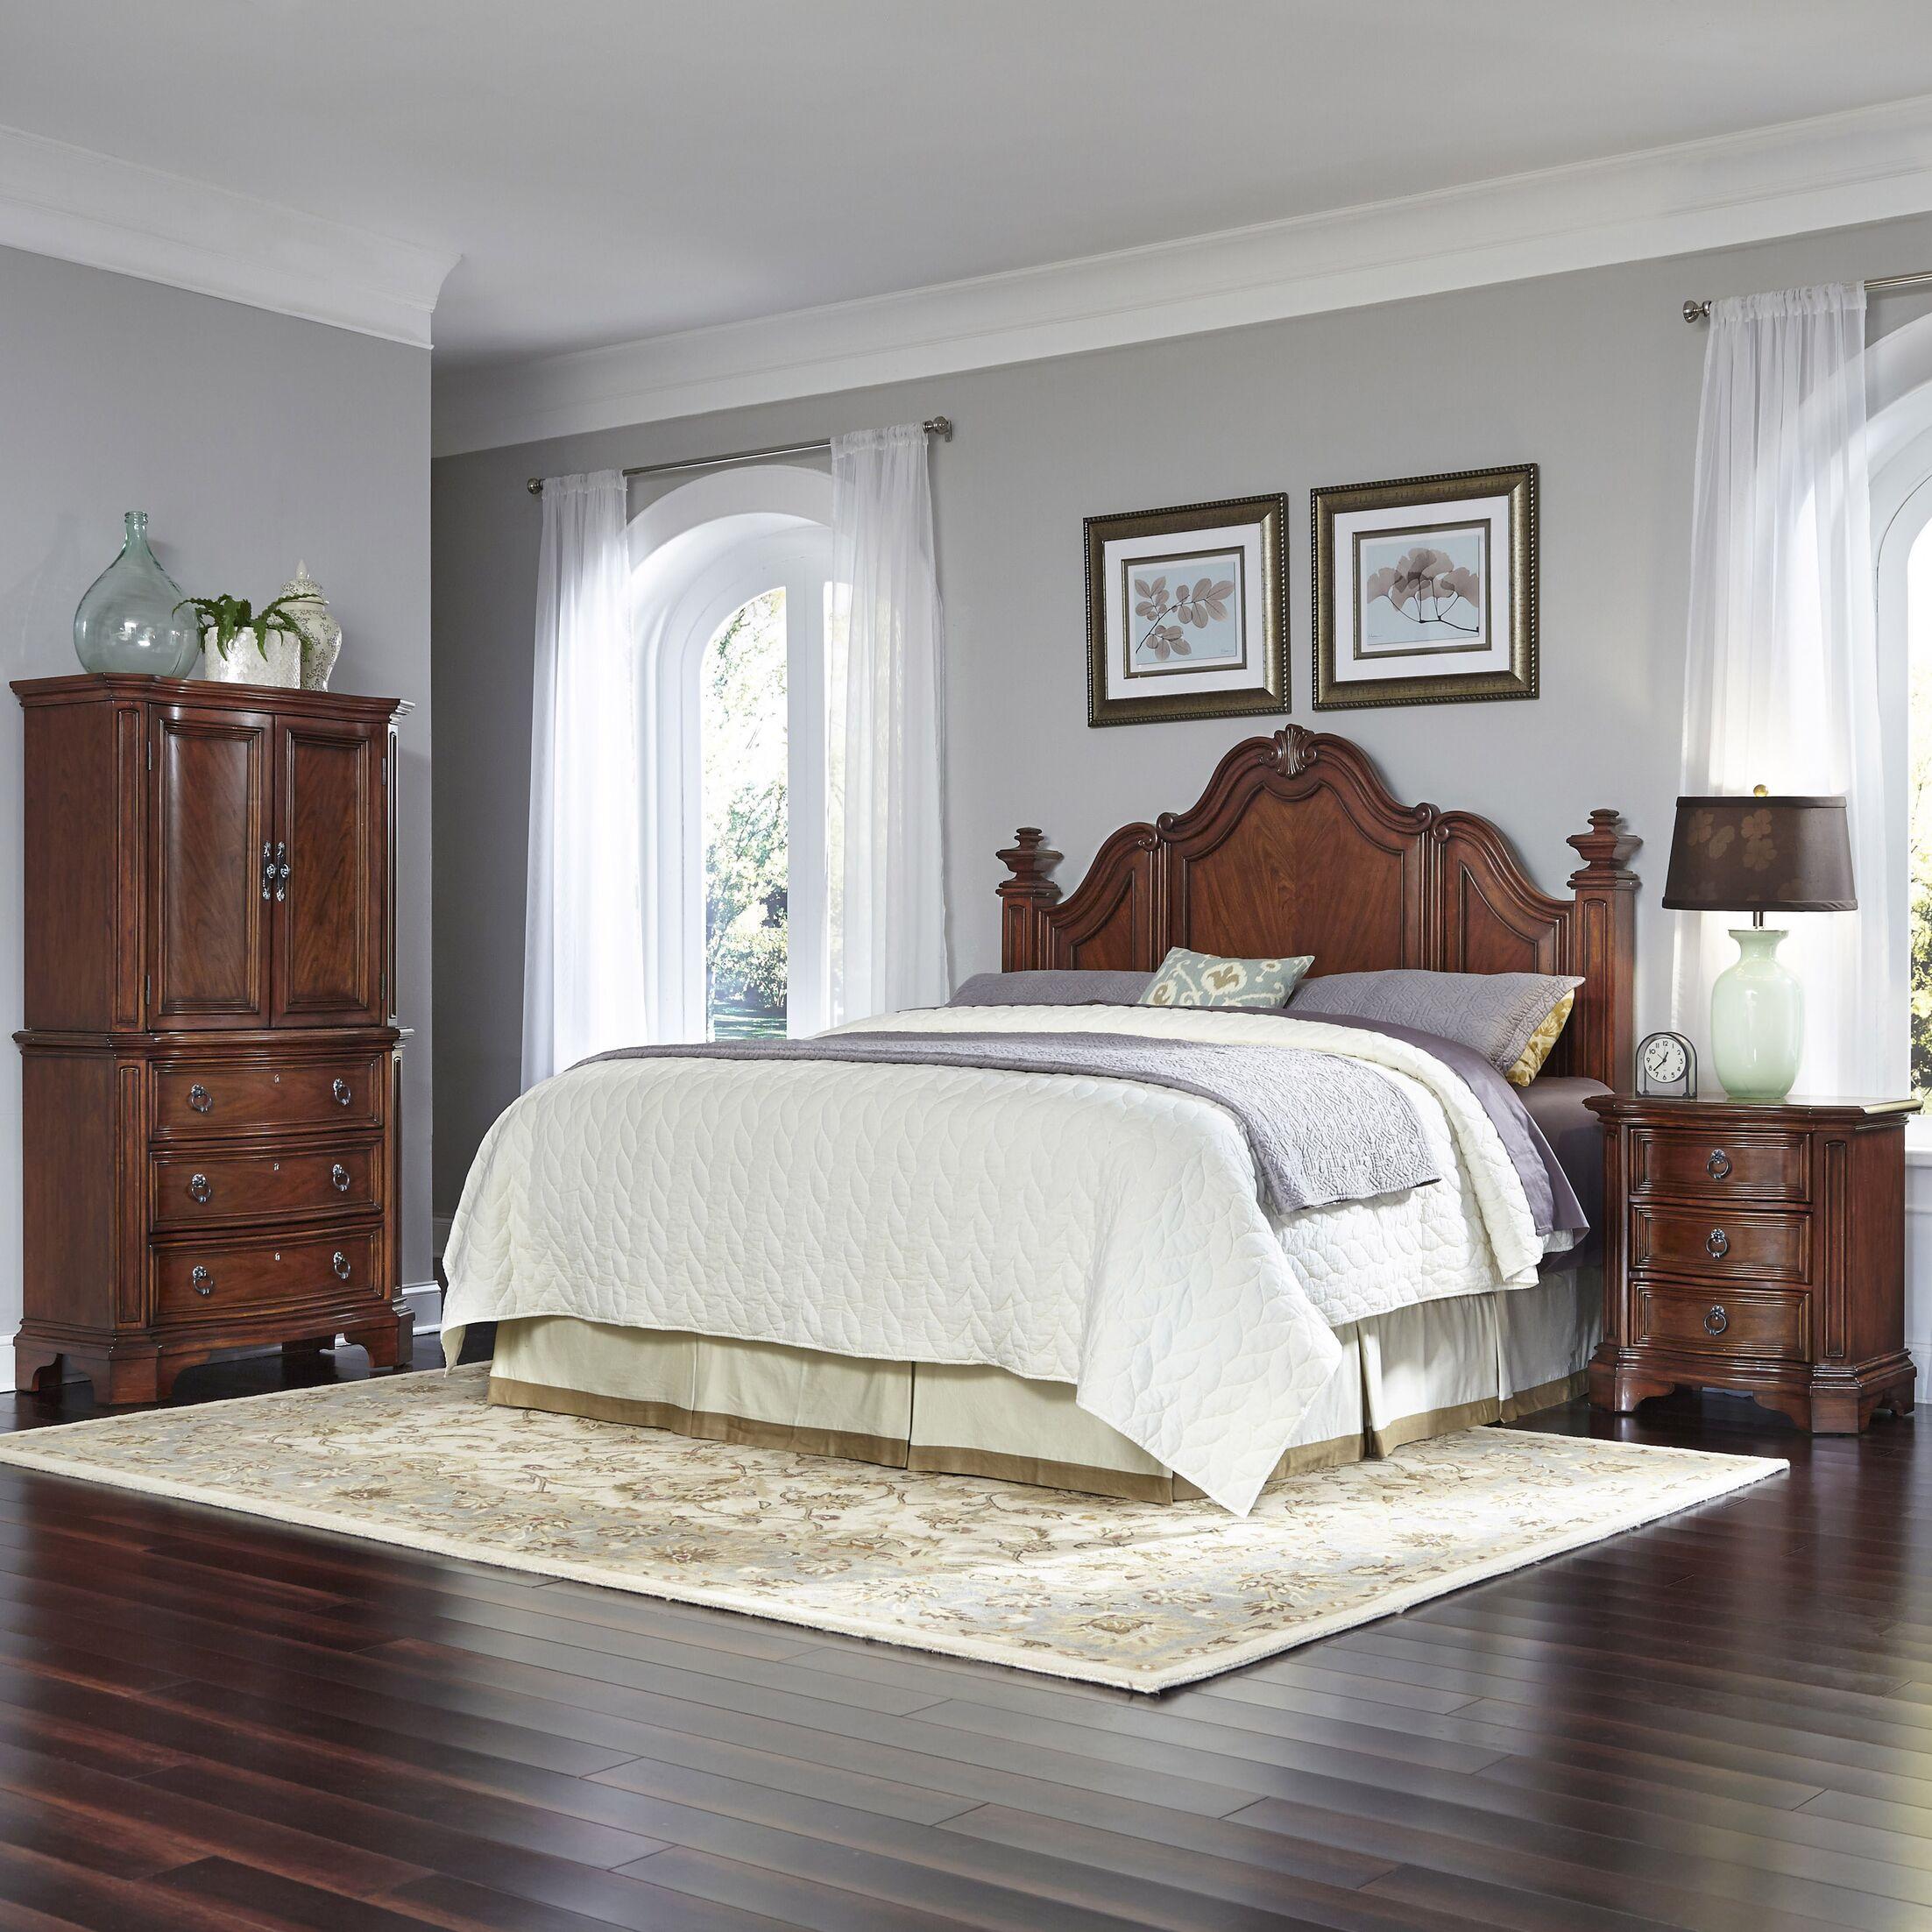 Santiago Platform 3 Piece Bedroom Set Size: King/California King